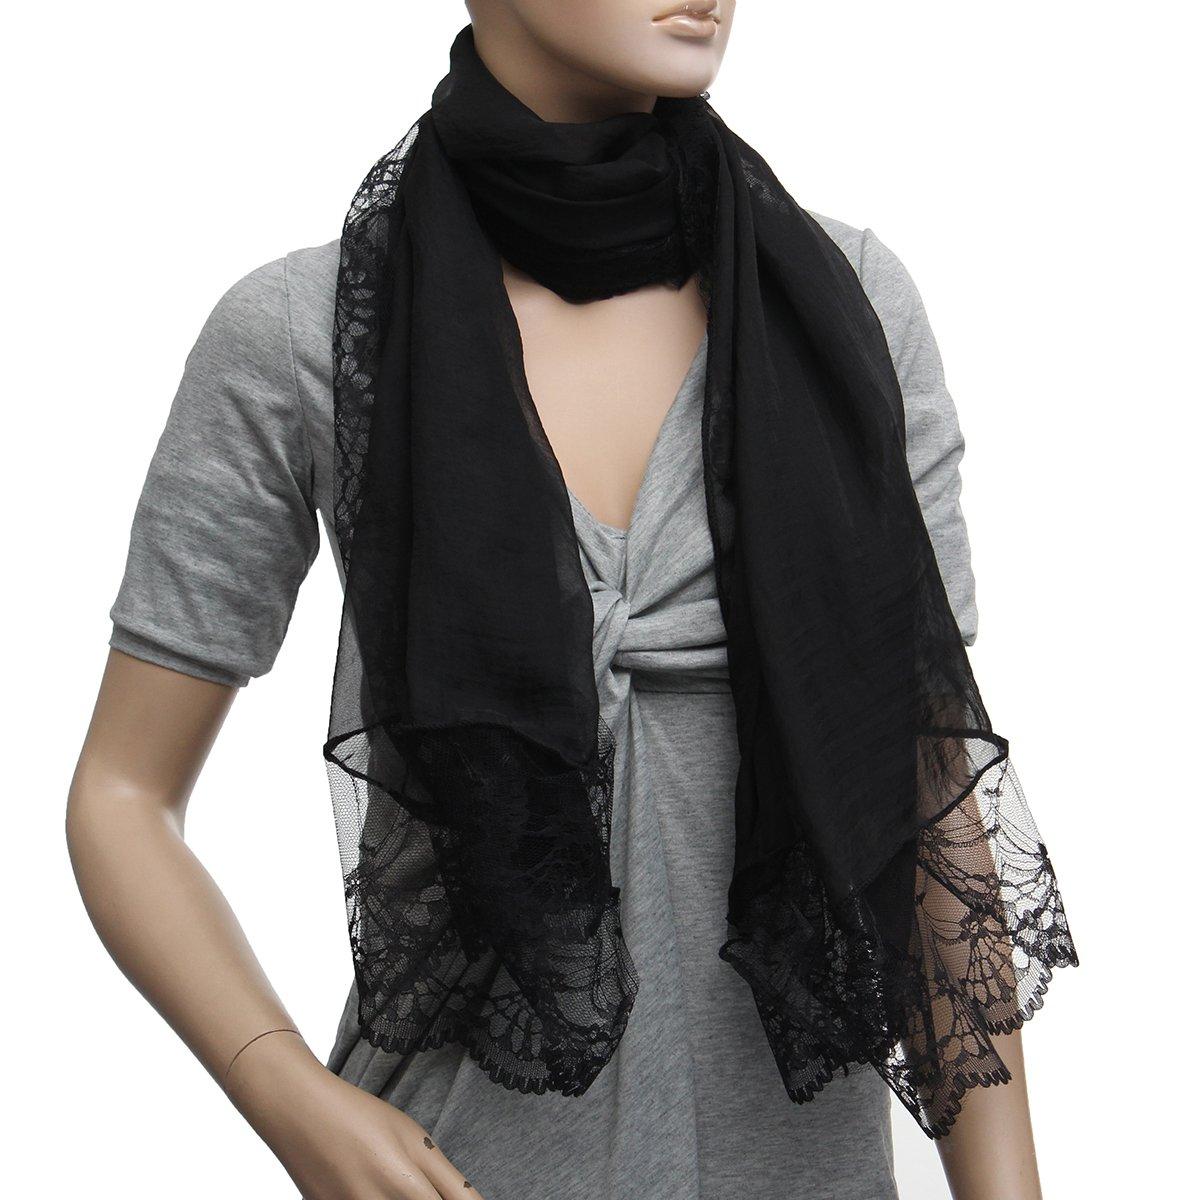 Hot Woman Scarves Chiffon Lace Scarf Wrap Scarf Black